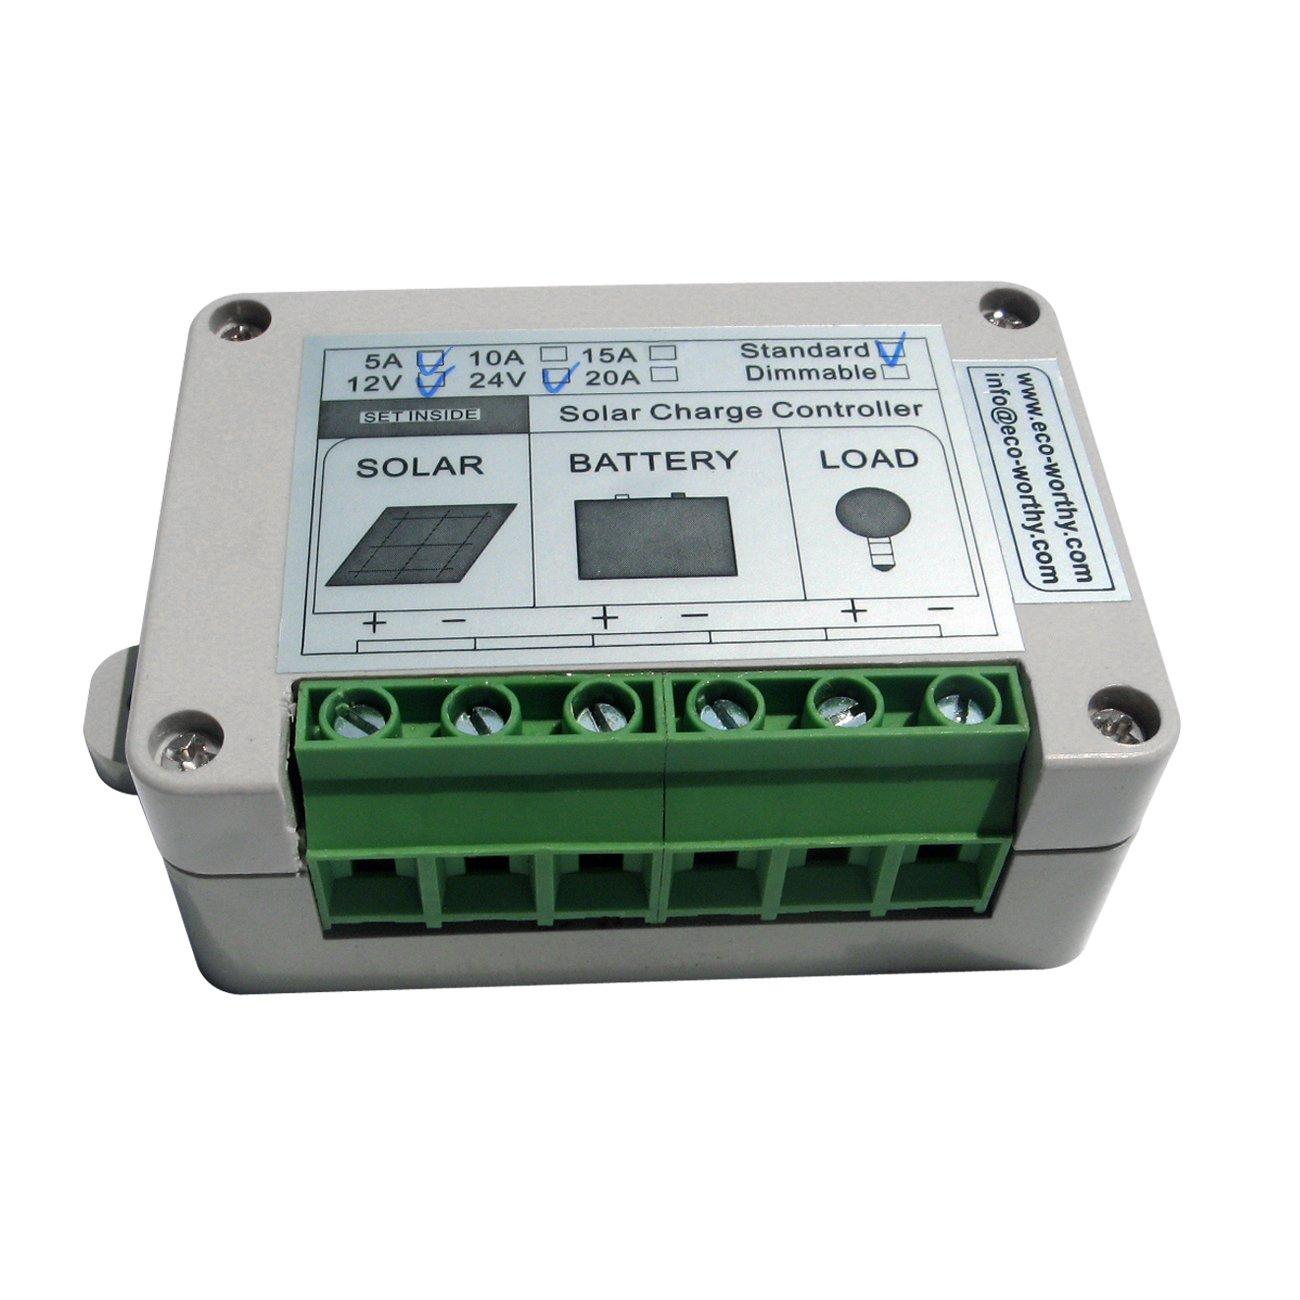 ECO-WORTHY 15A PWM Solar Panel Charge Controller 12V/24V Battery Regulator